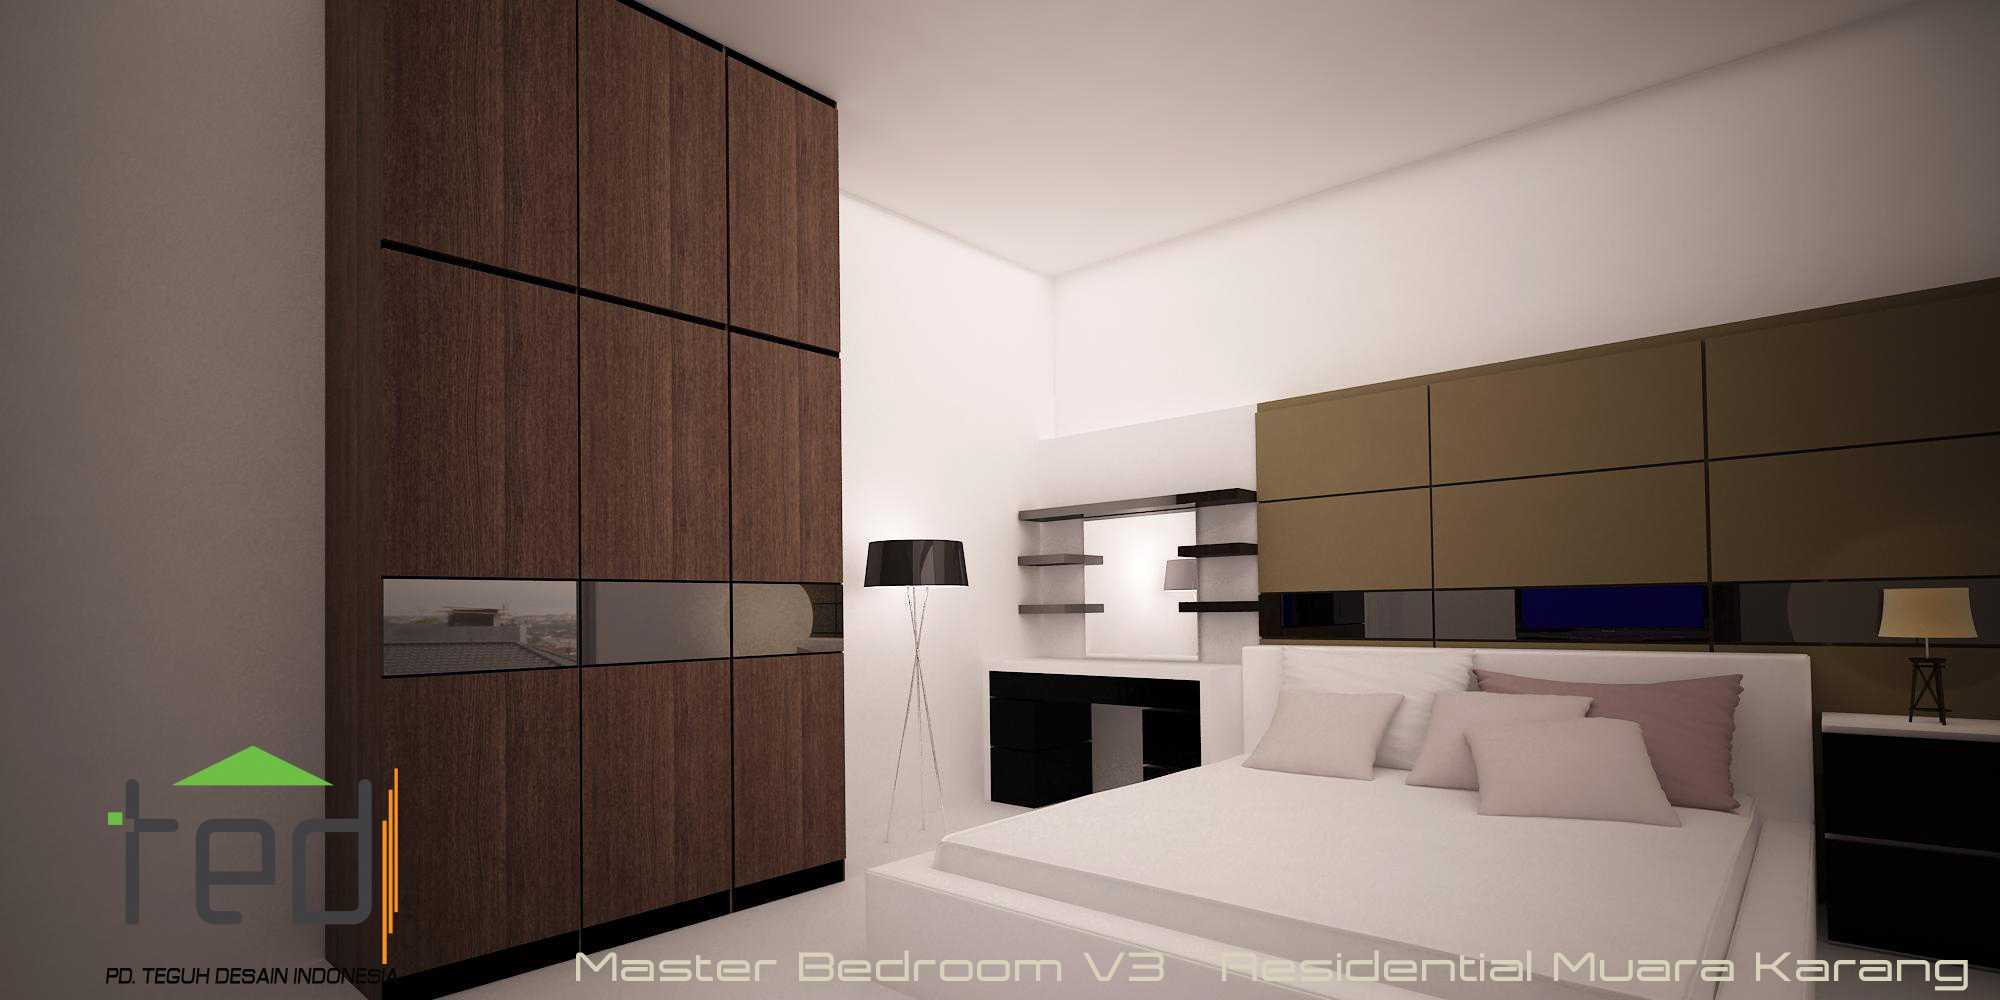 Pd Teguh Desain Indonesia Muara Karang Residence Jakarta, Indonesia Jakarta, Indonesia Master-Bedroom-V3 Modern  35114